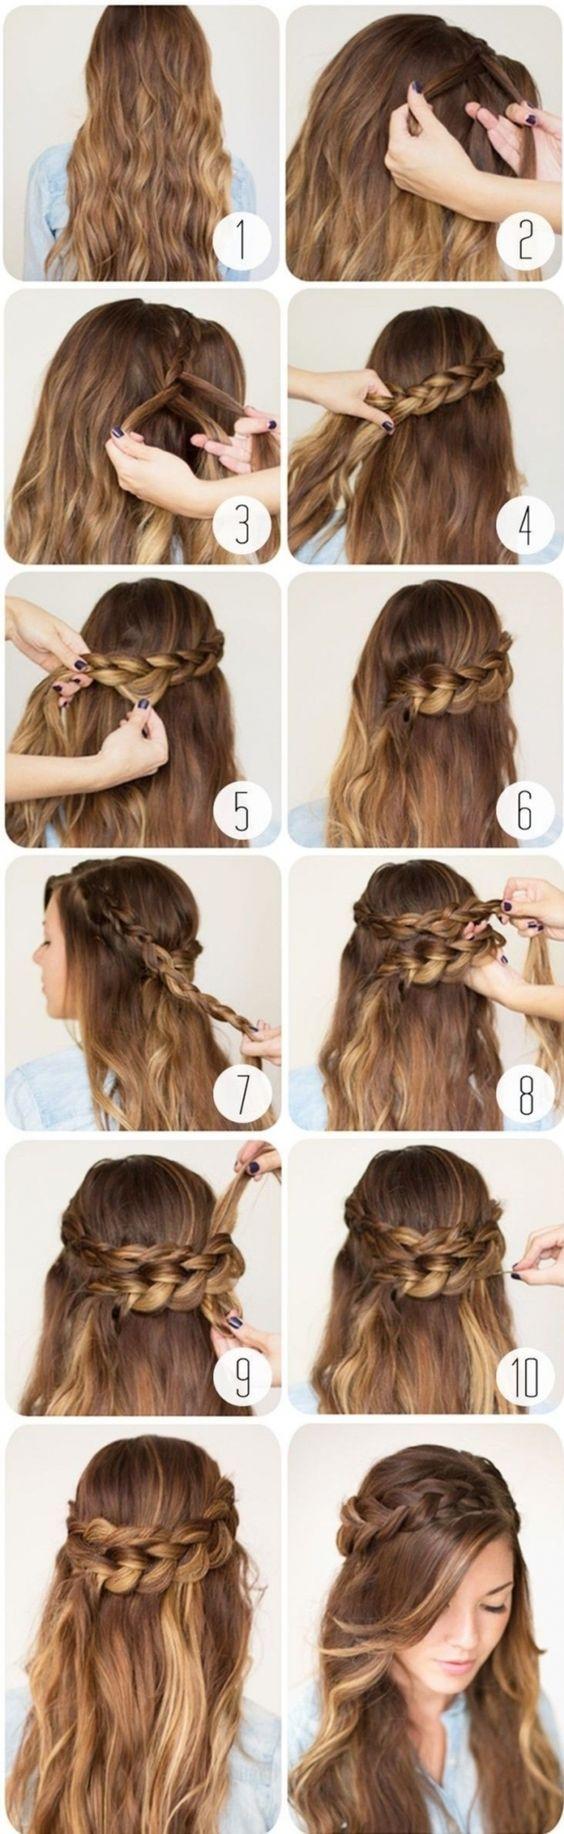 Graduation hairstyles u outfit tips cute hair ideas pinterest